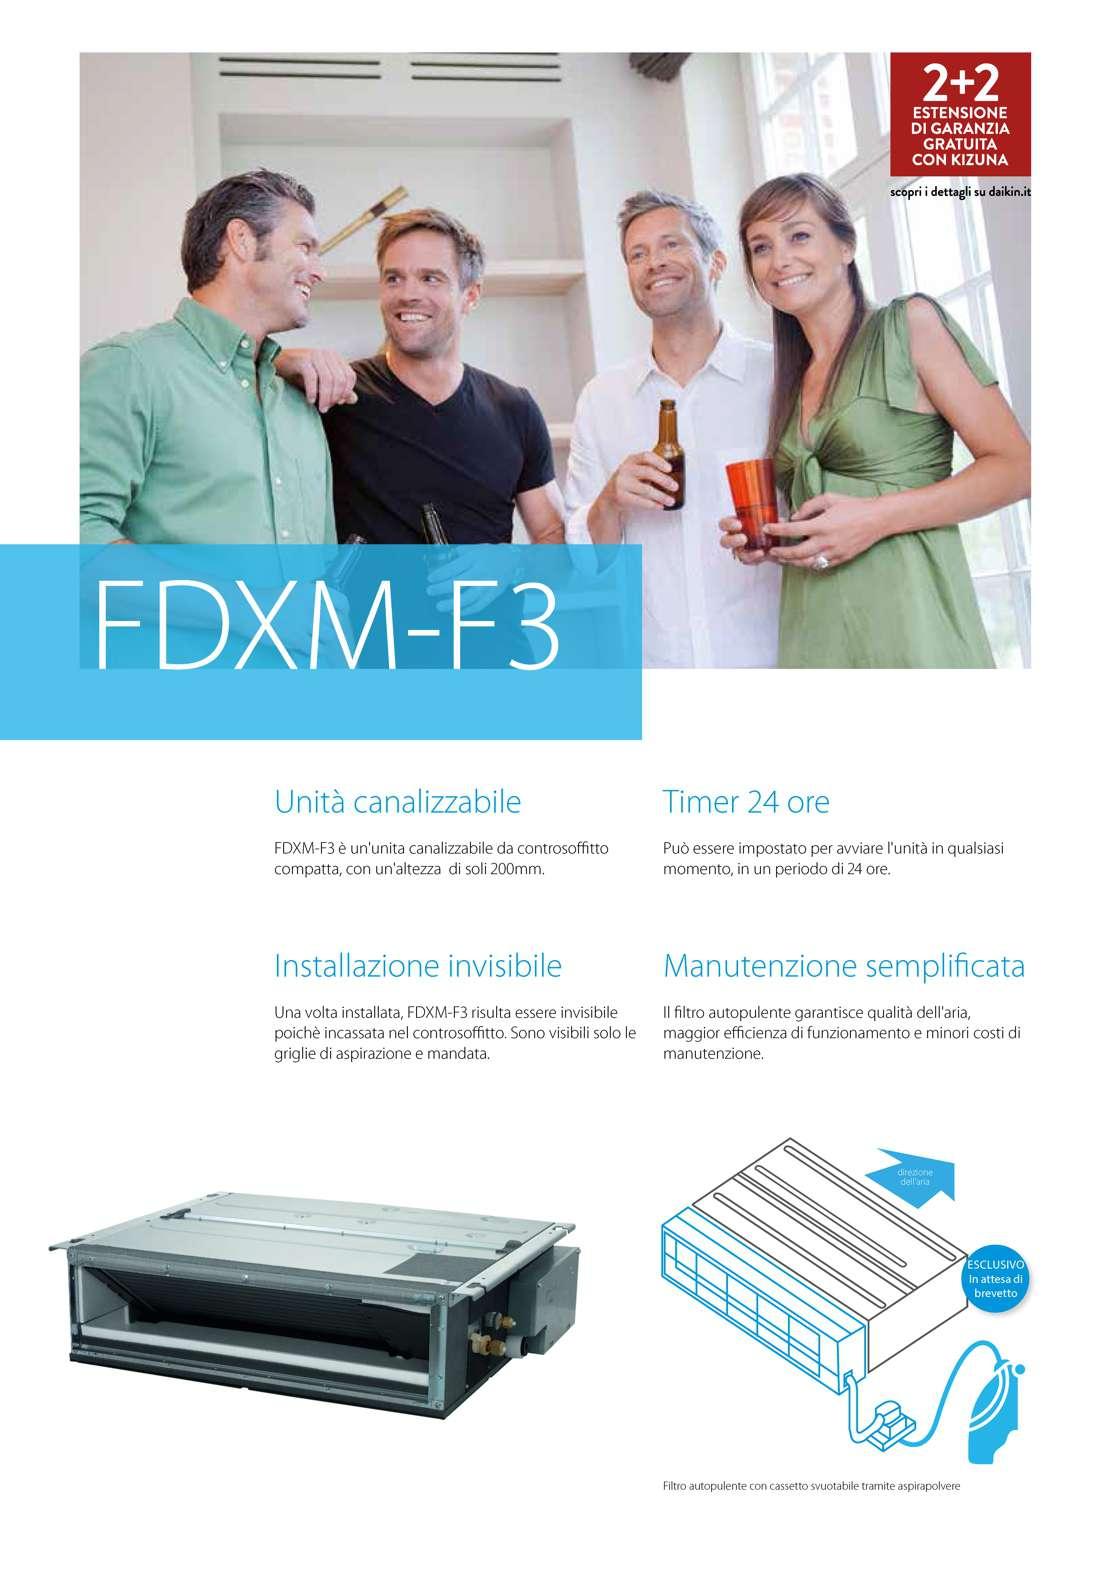 Climatizzatore Daikin Mod Fdxm F3 12000 Btu Fdxm35f3 Rxm35m9